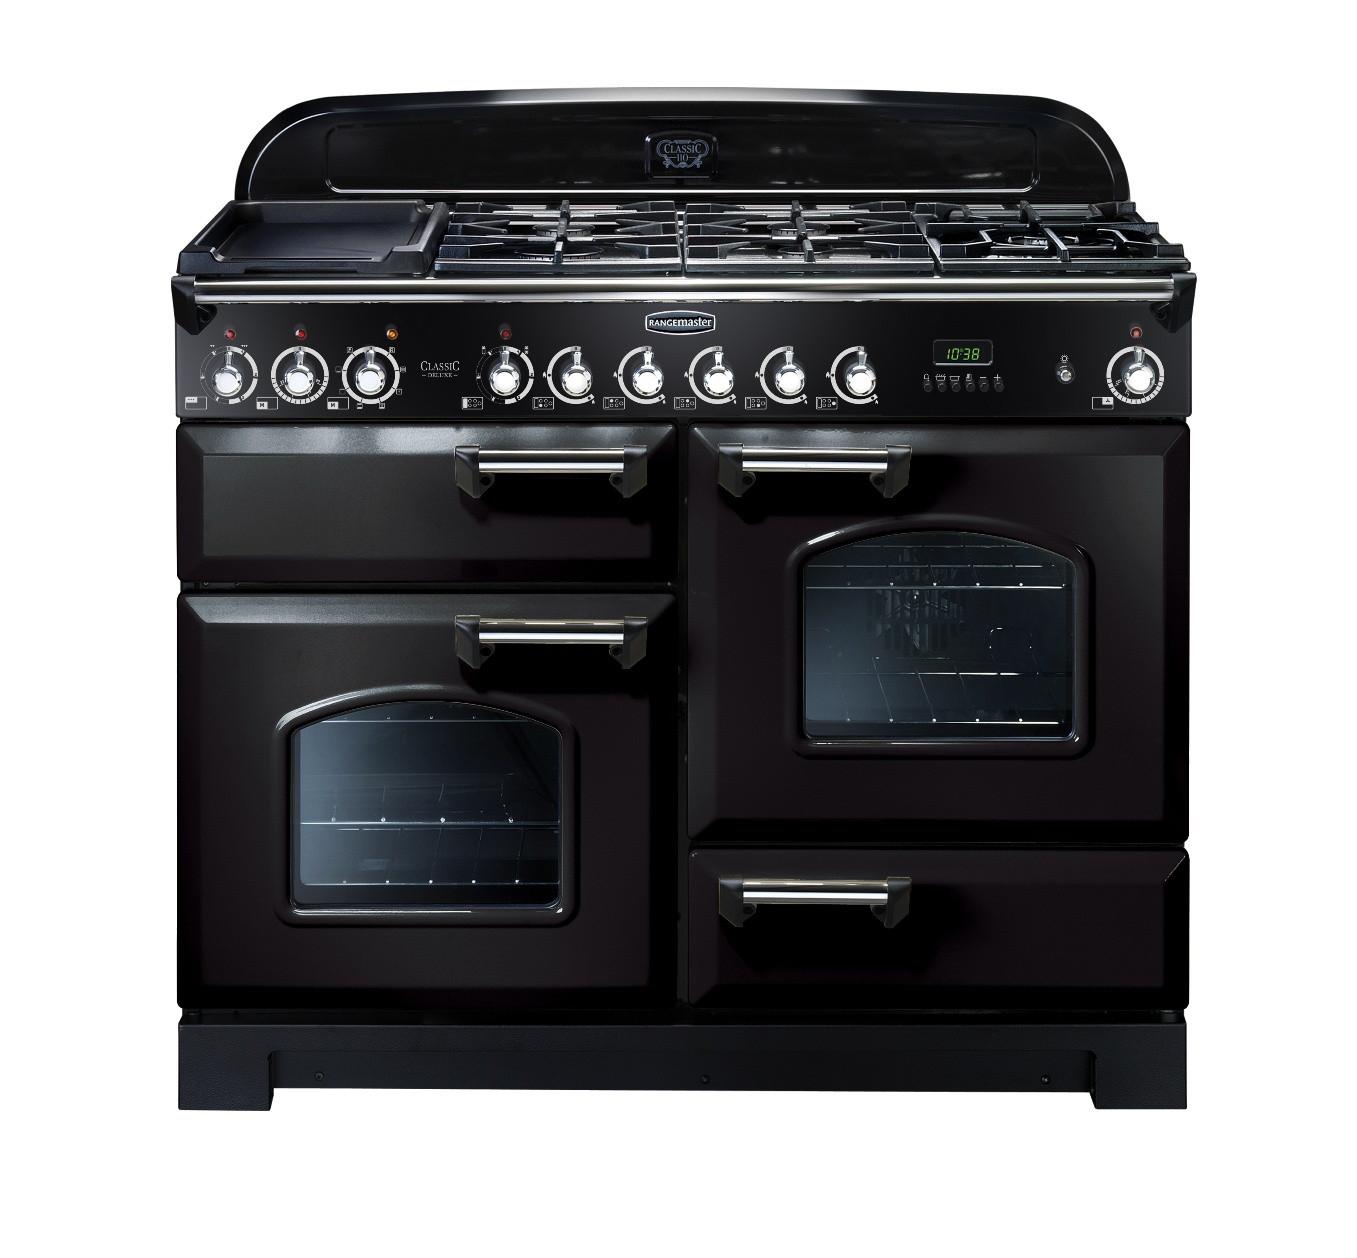 Rangemaster Classic Deluxe 110 Dual Fuel Range Cooker Black/Chrome 79780